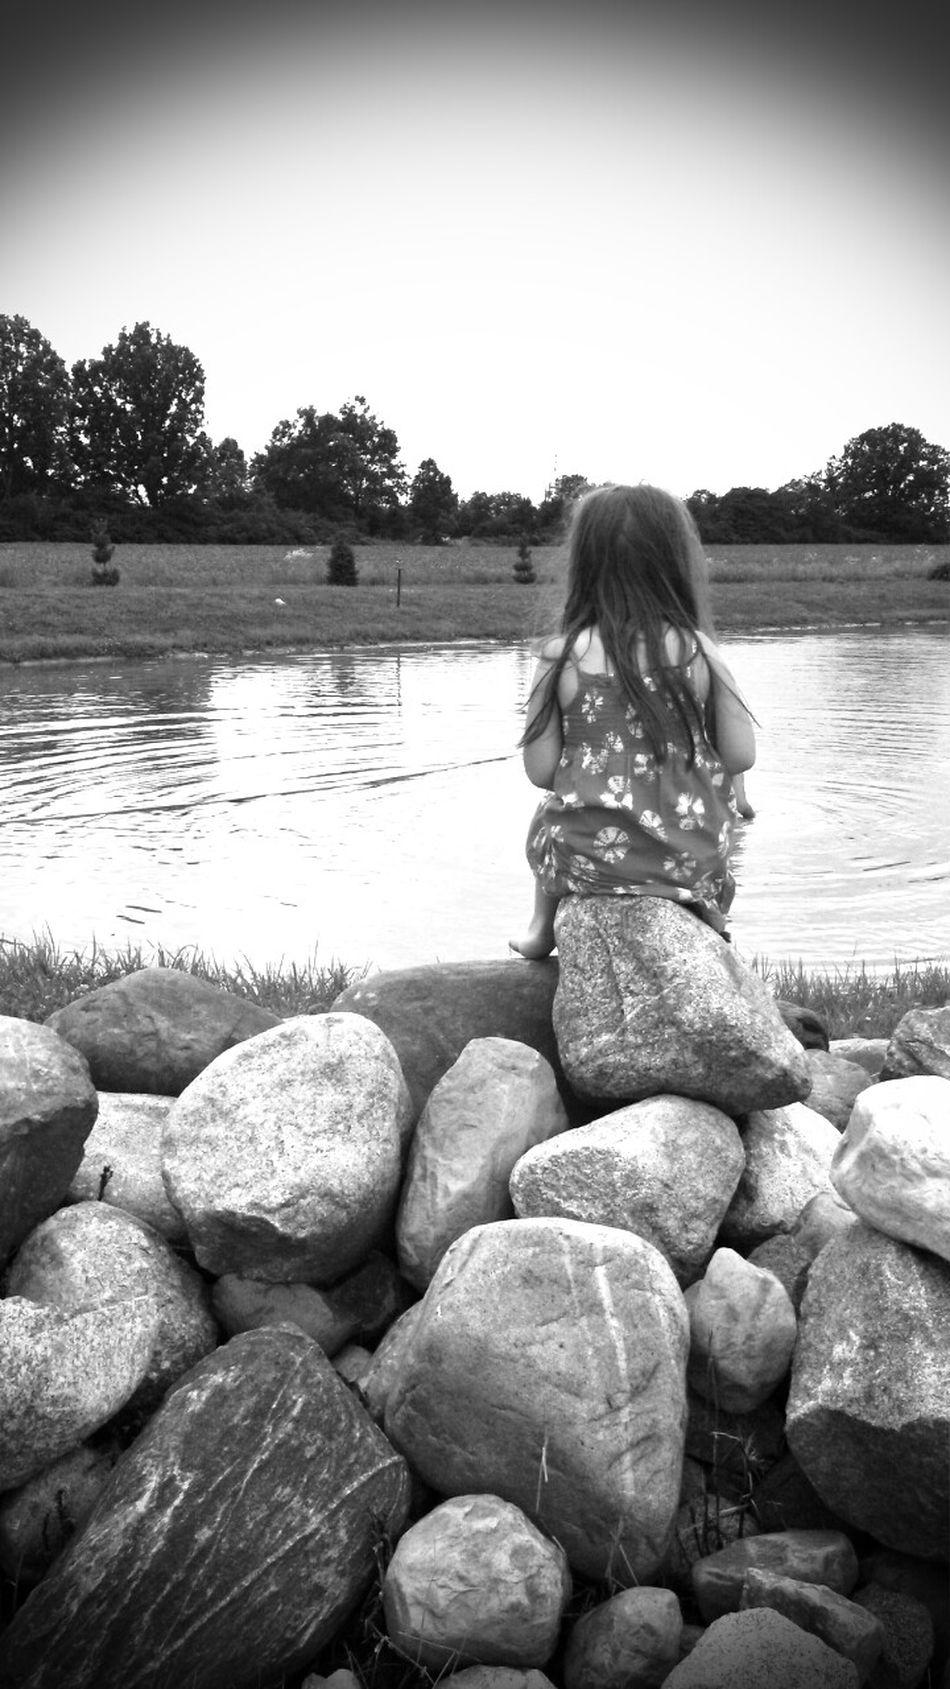 Childhood thoughts Children Childhood Pond Rocks Landscape Deep Thoughts Stronglittlegirl Enjoylifediana Phoyography